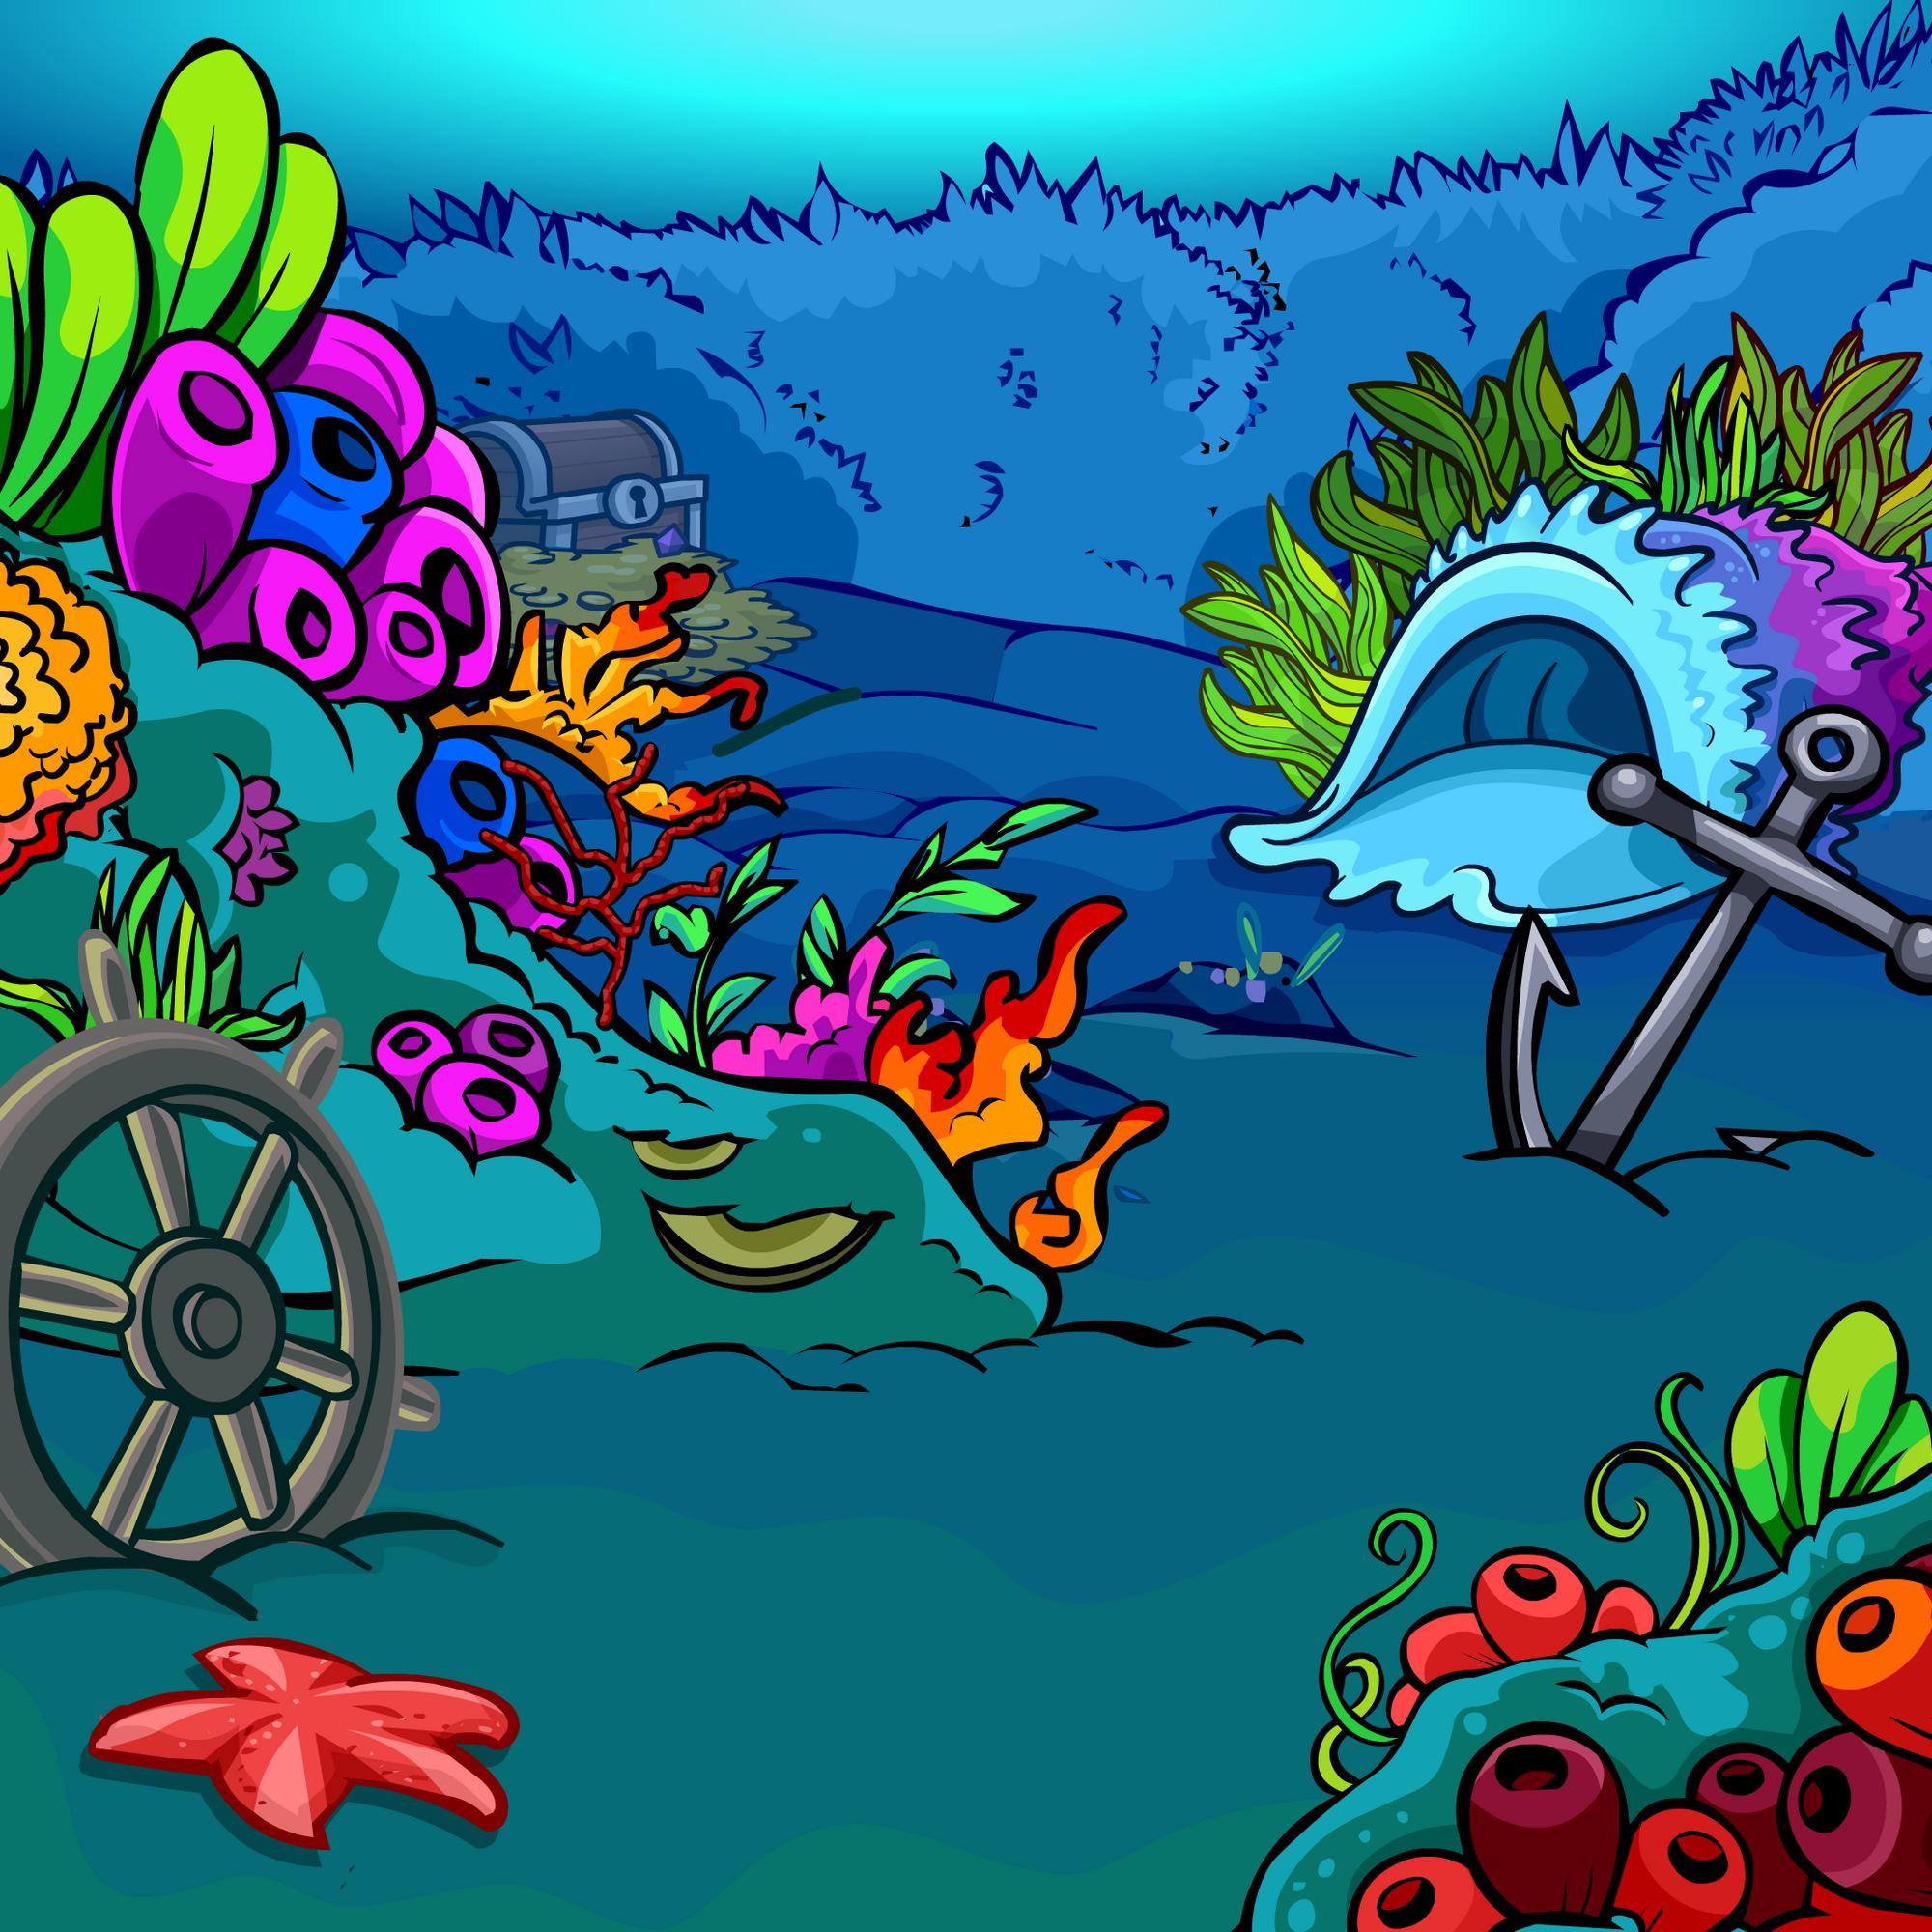 Coral Reef Background: Coral Reef Background